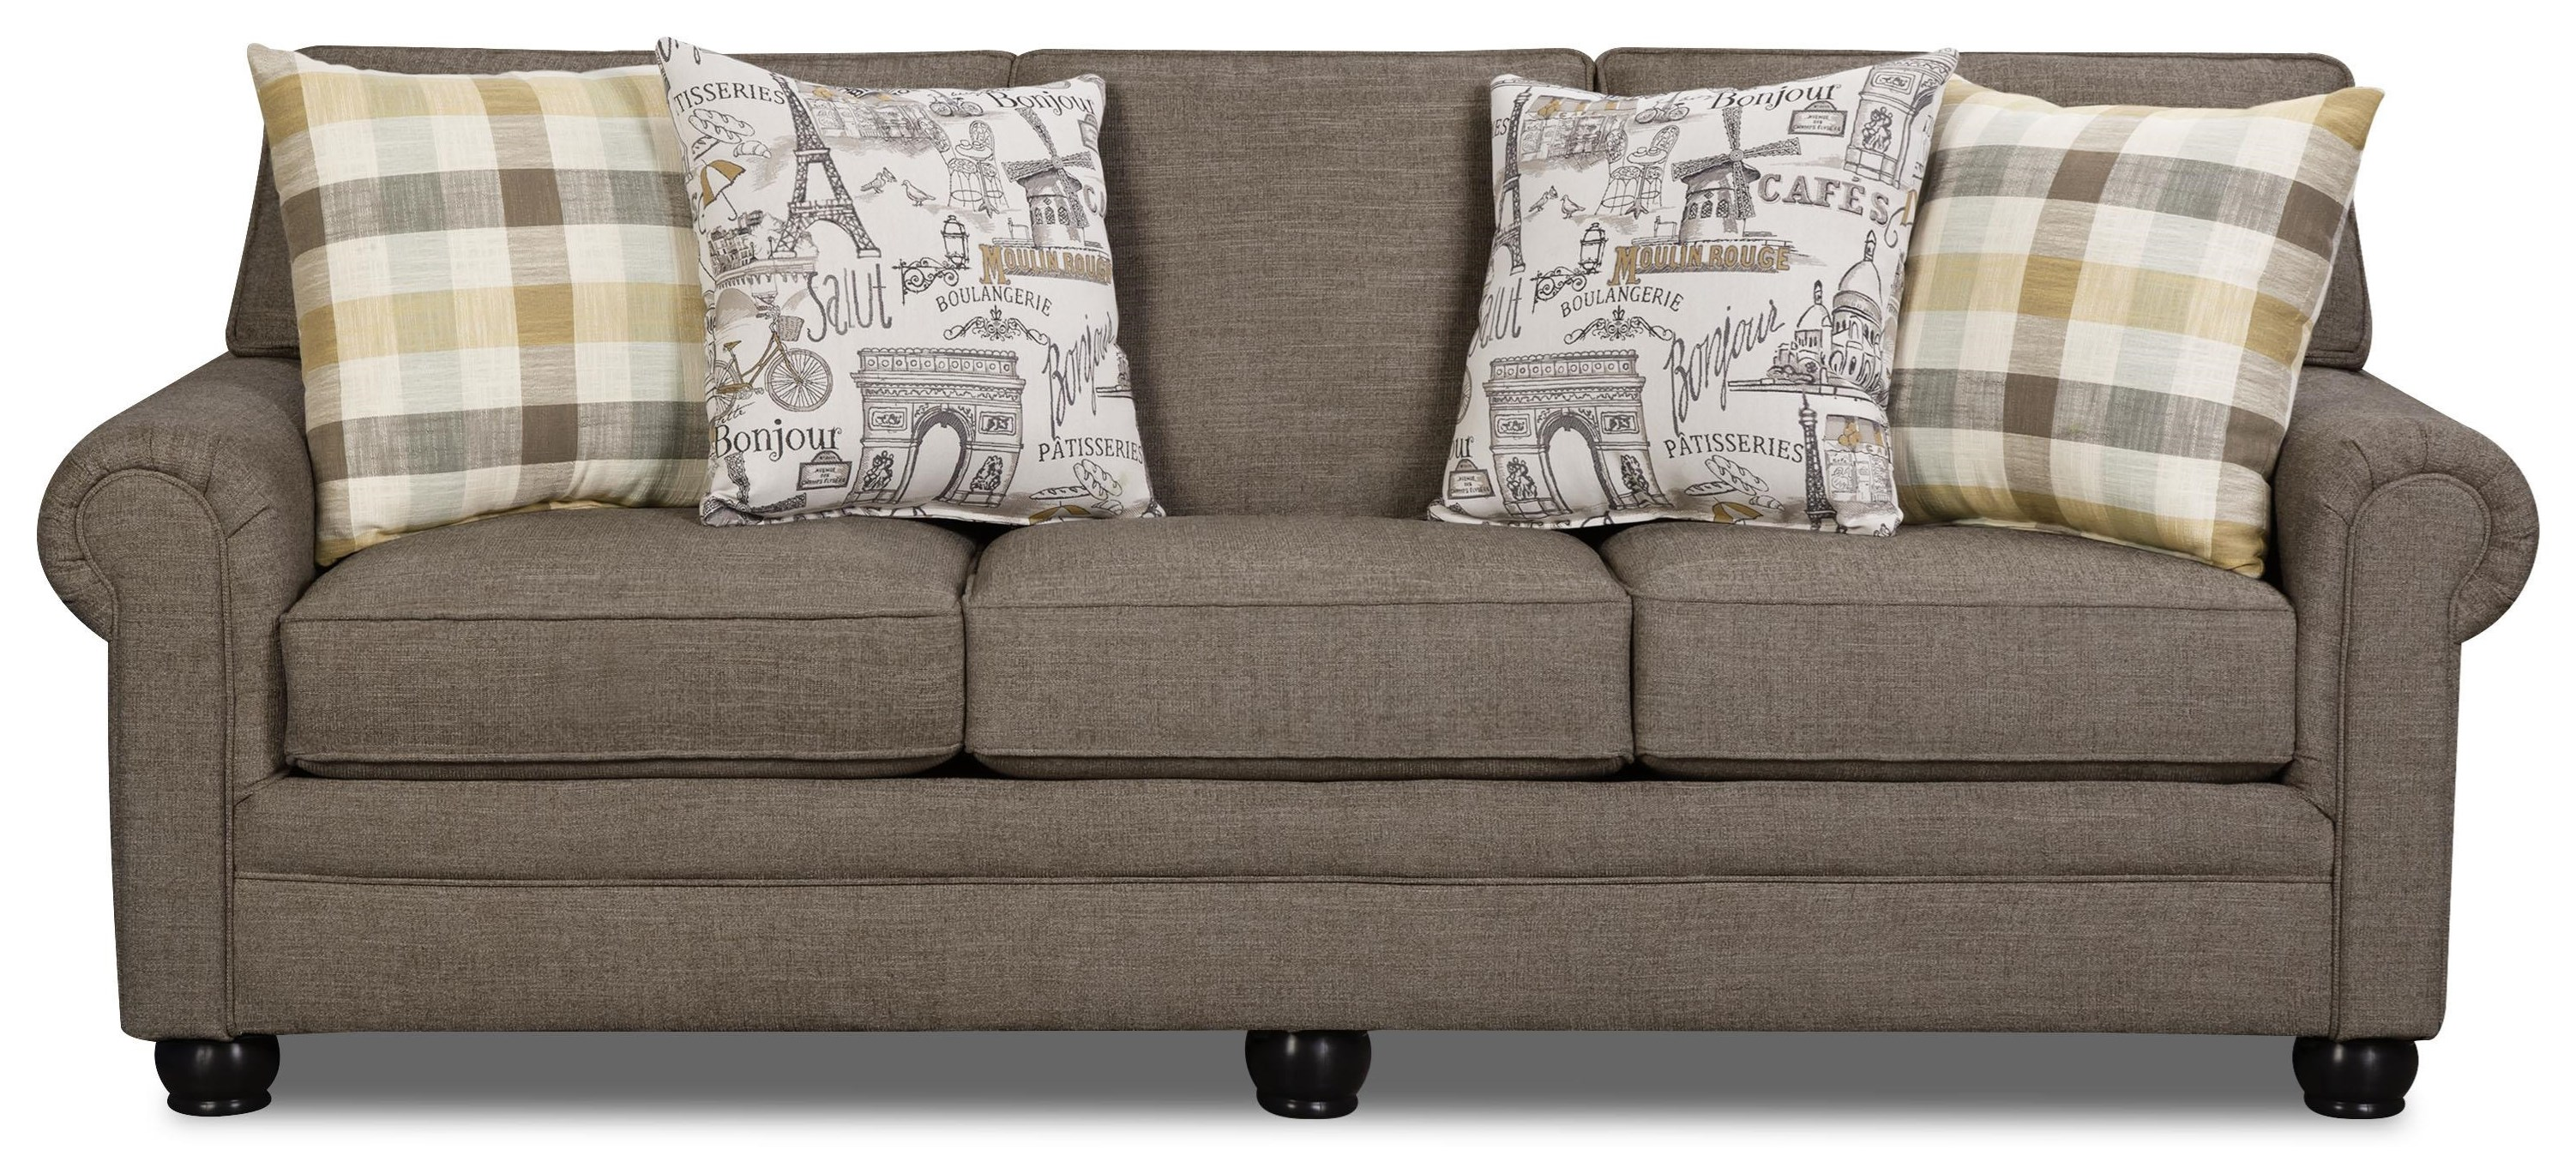 Corinthian Lilou Shadow Sleeper Sofa - Item Number: 97D4